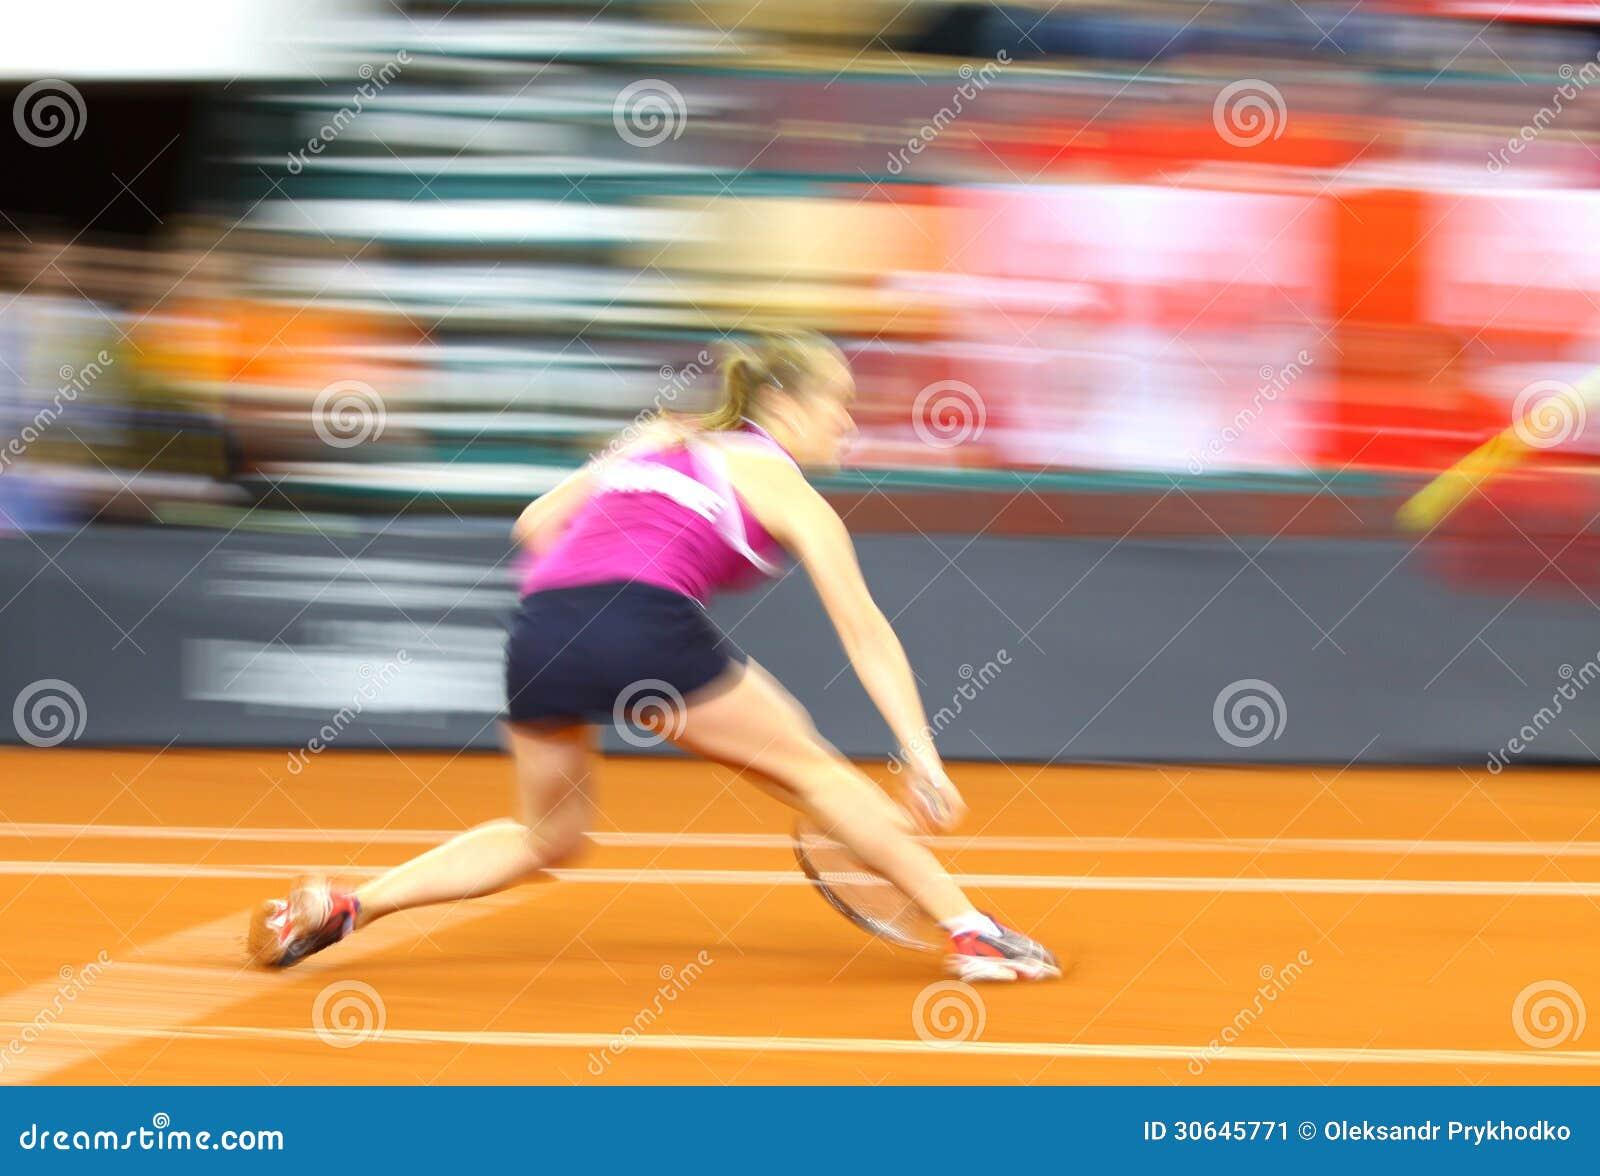 fedcup tennis game ukraine vs canada editorial photo image 30645771. Black Bedroom Furniture Sets. Home Design Ideas